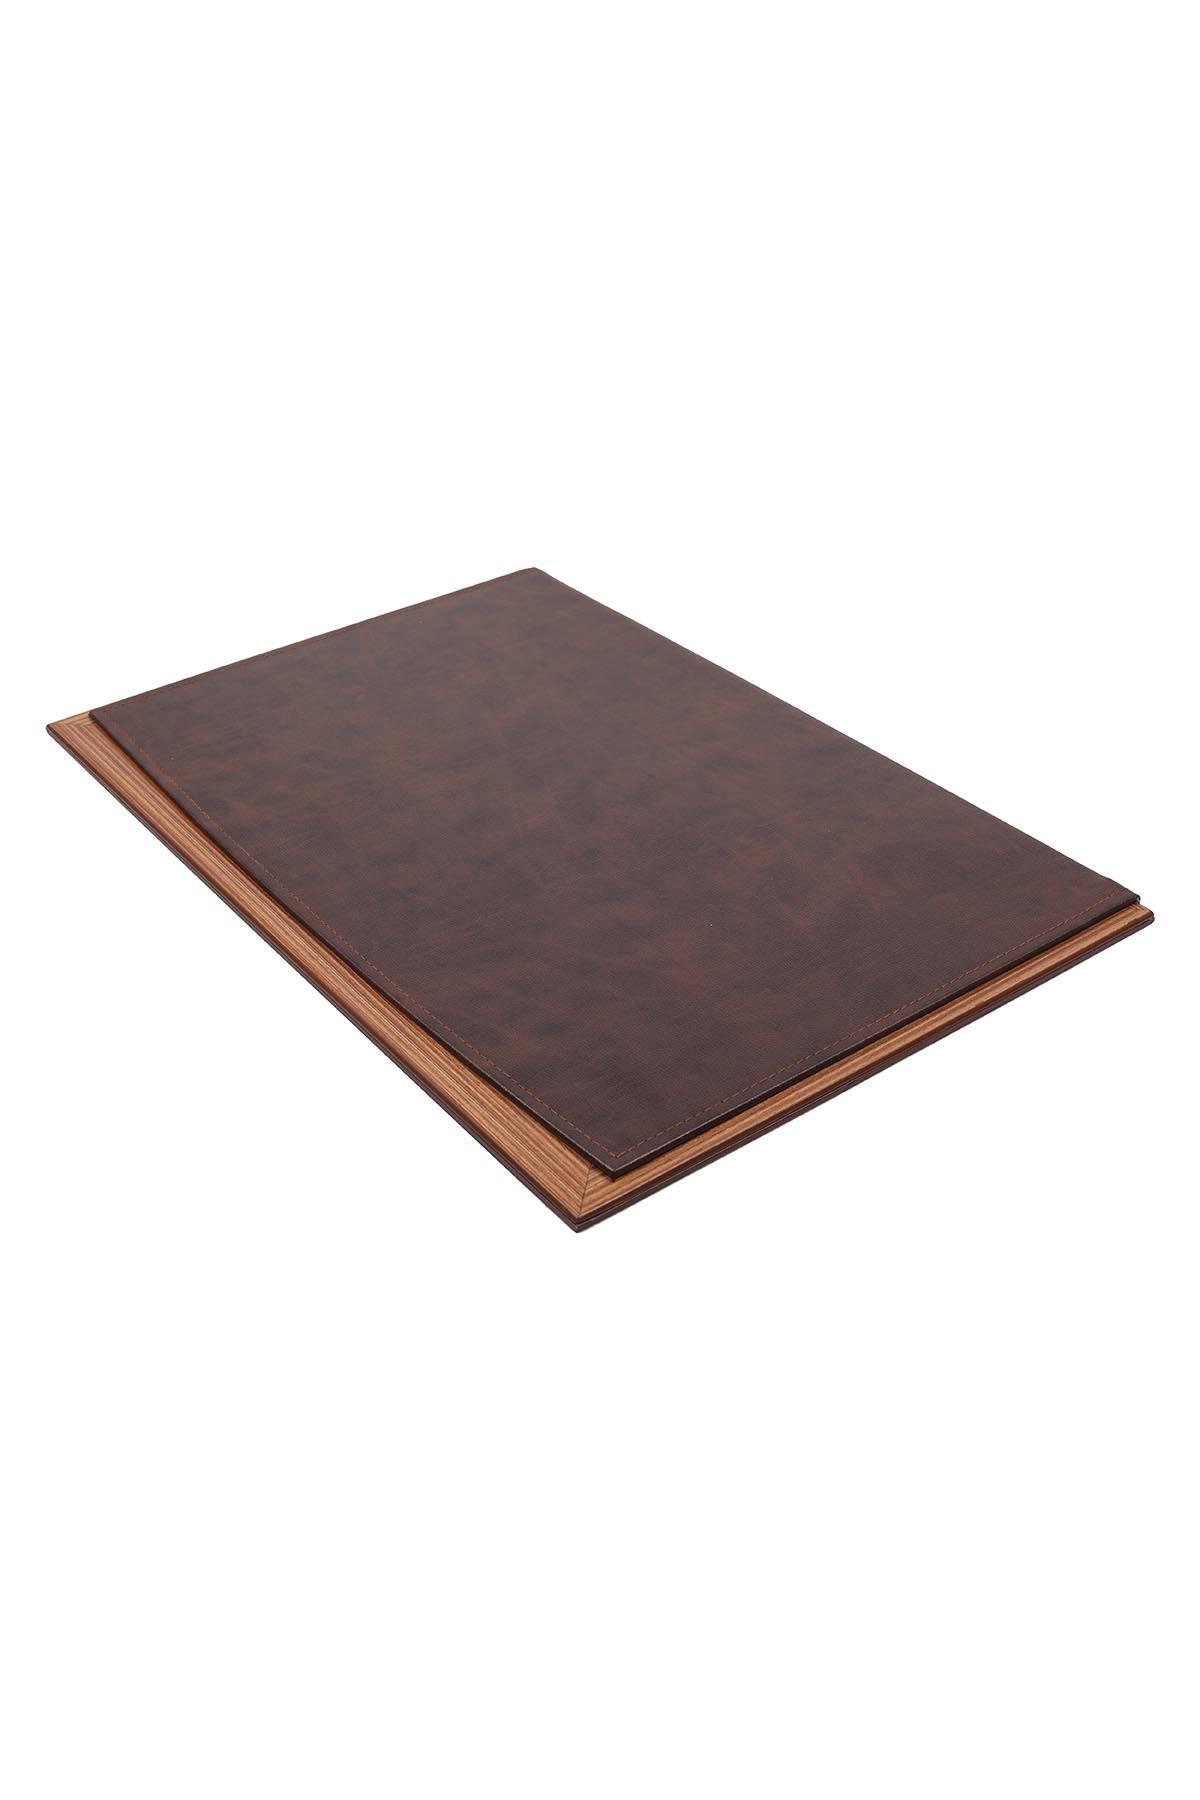 Star Lux Leather Desk Set Brown 11 Accessories